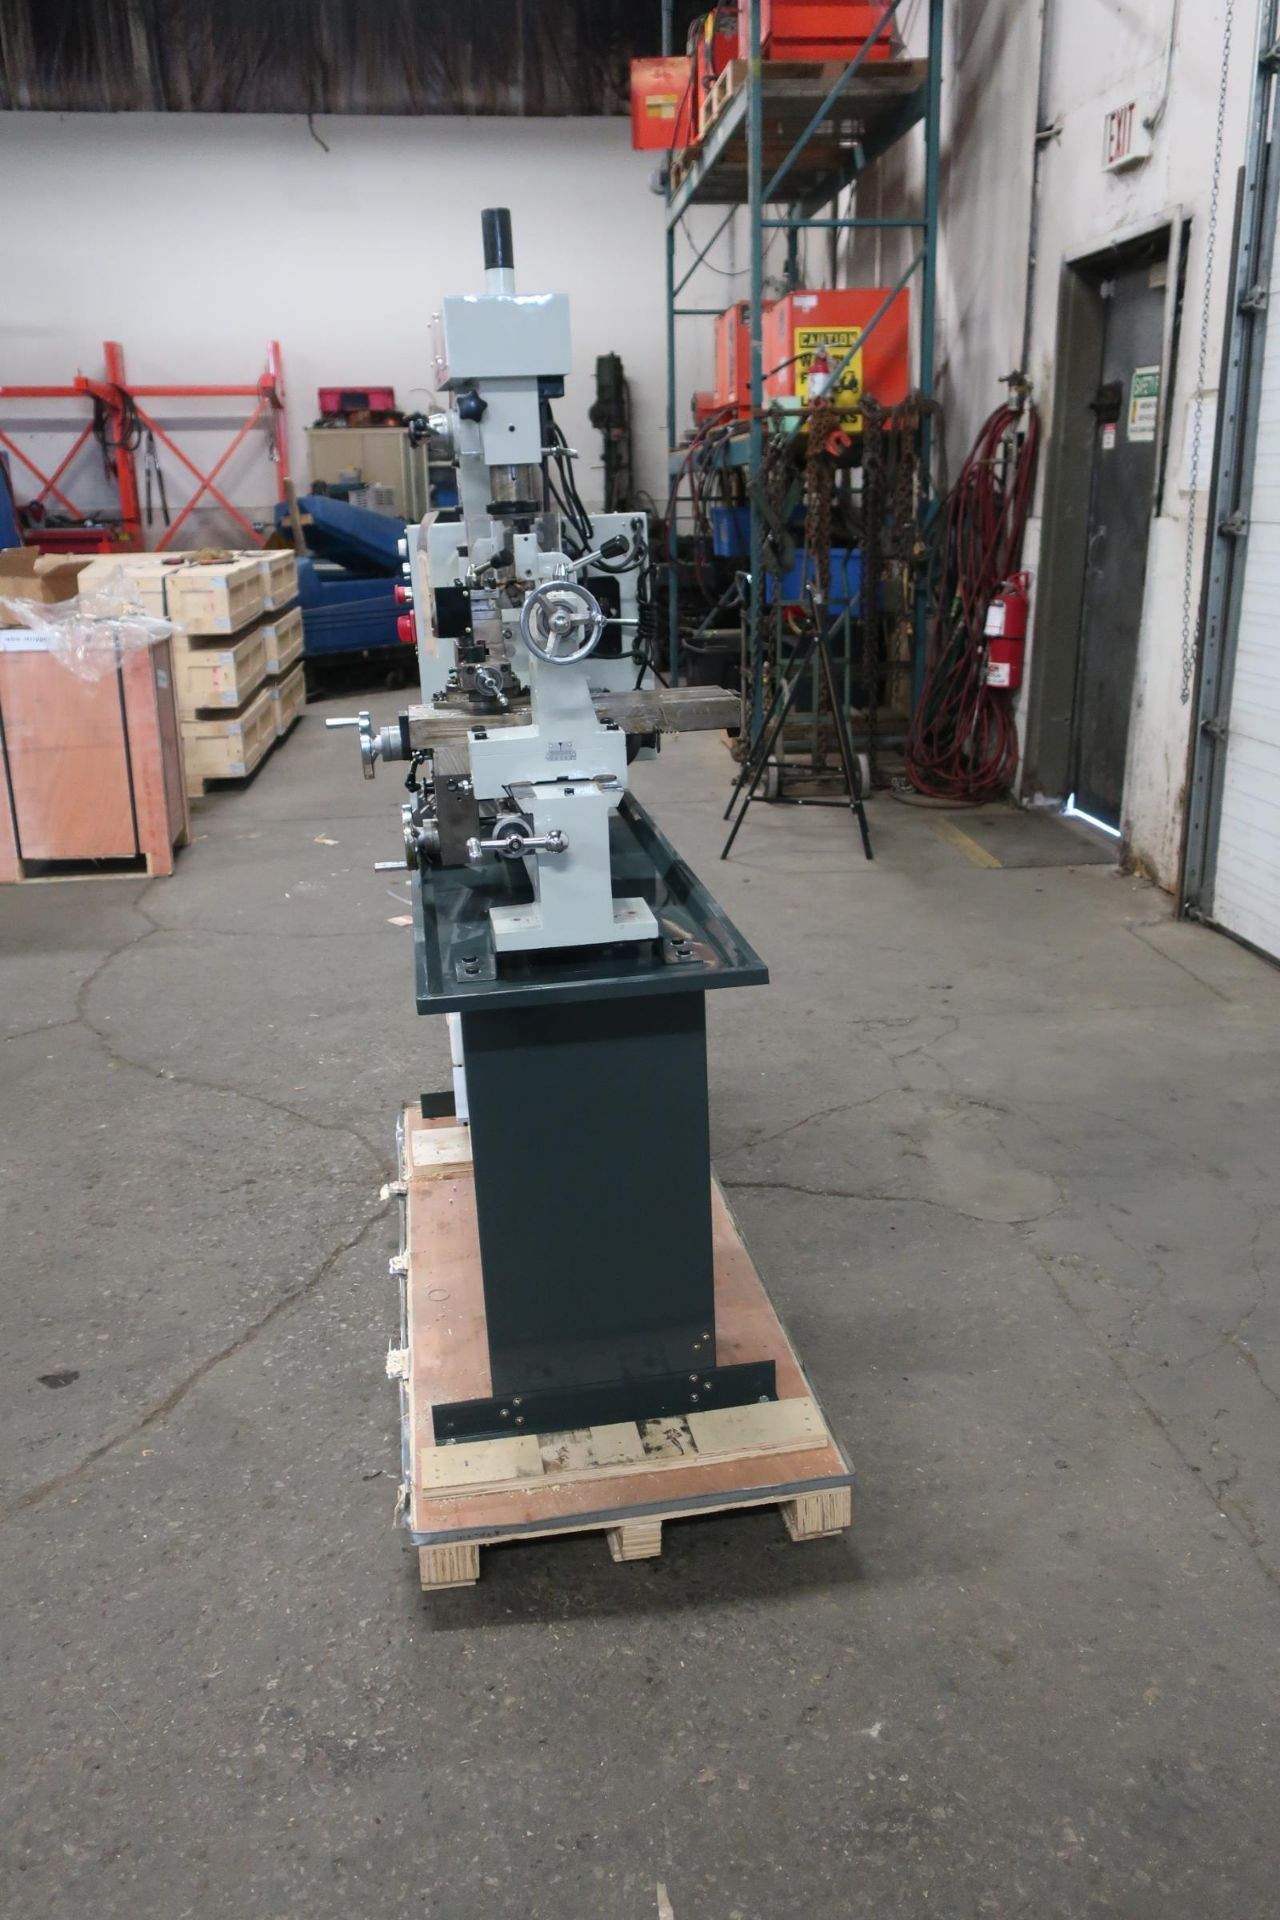 "Bernardo Lathe / Mill / Drill Combo LATHE: 31.5"" X 16.5"" swing, MT4 spindle, MT3 tailstock, DRILL/ - Image 3 of 3"